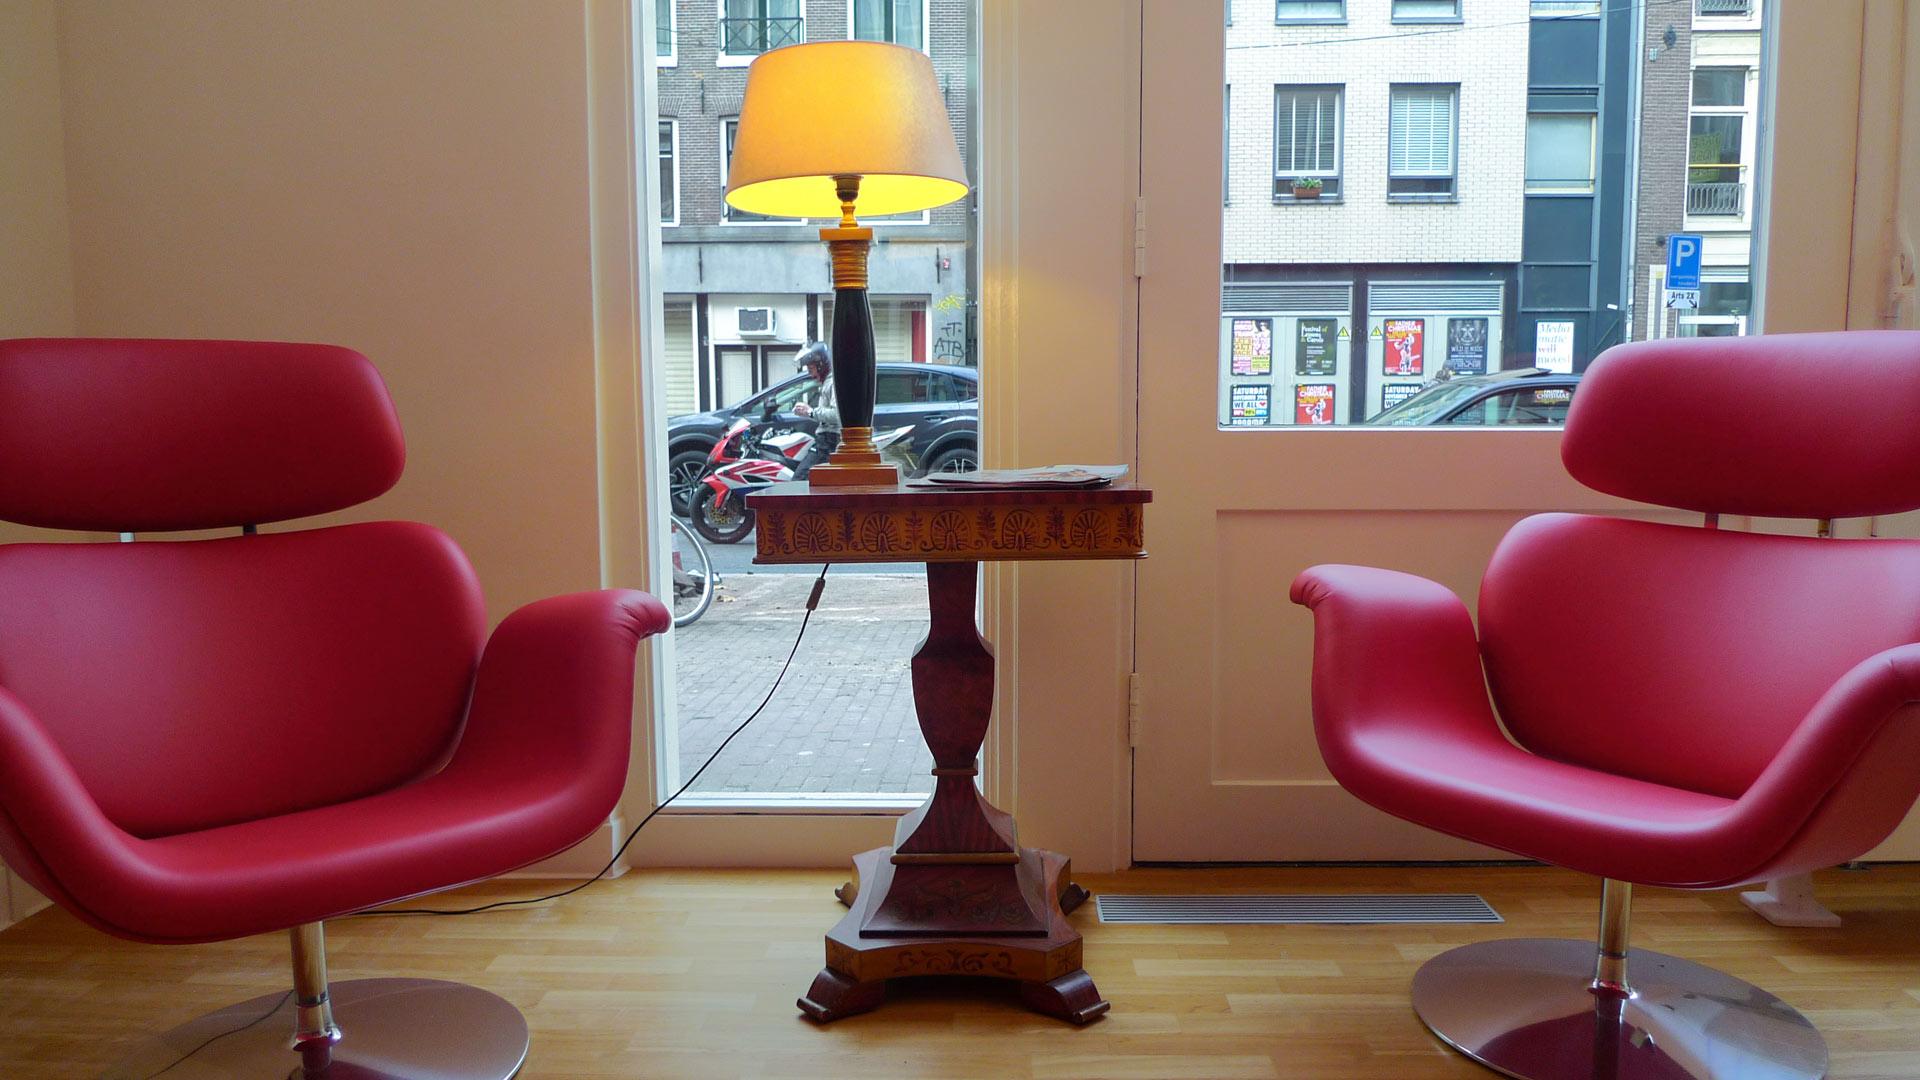 NewJoy-concepts-Cardiologie-OVLG-locatie-Spuistraat-Amsterdam